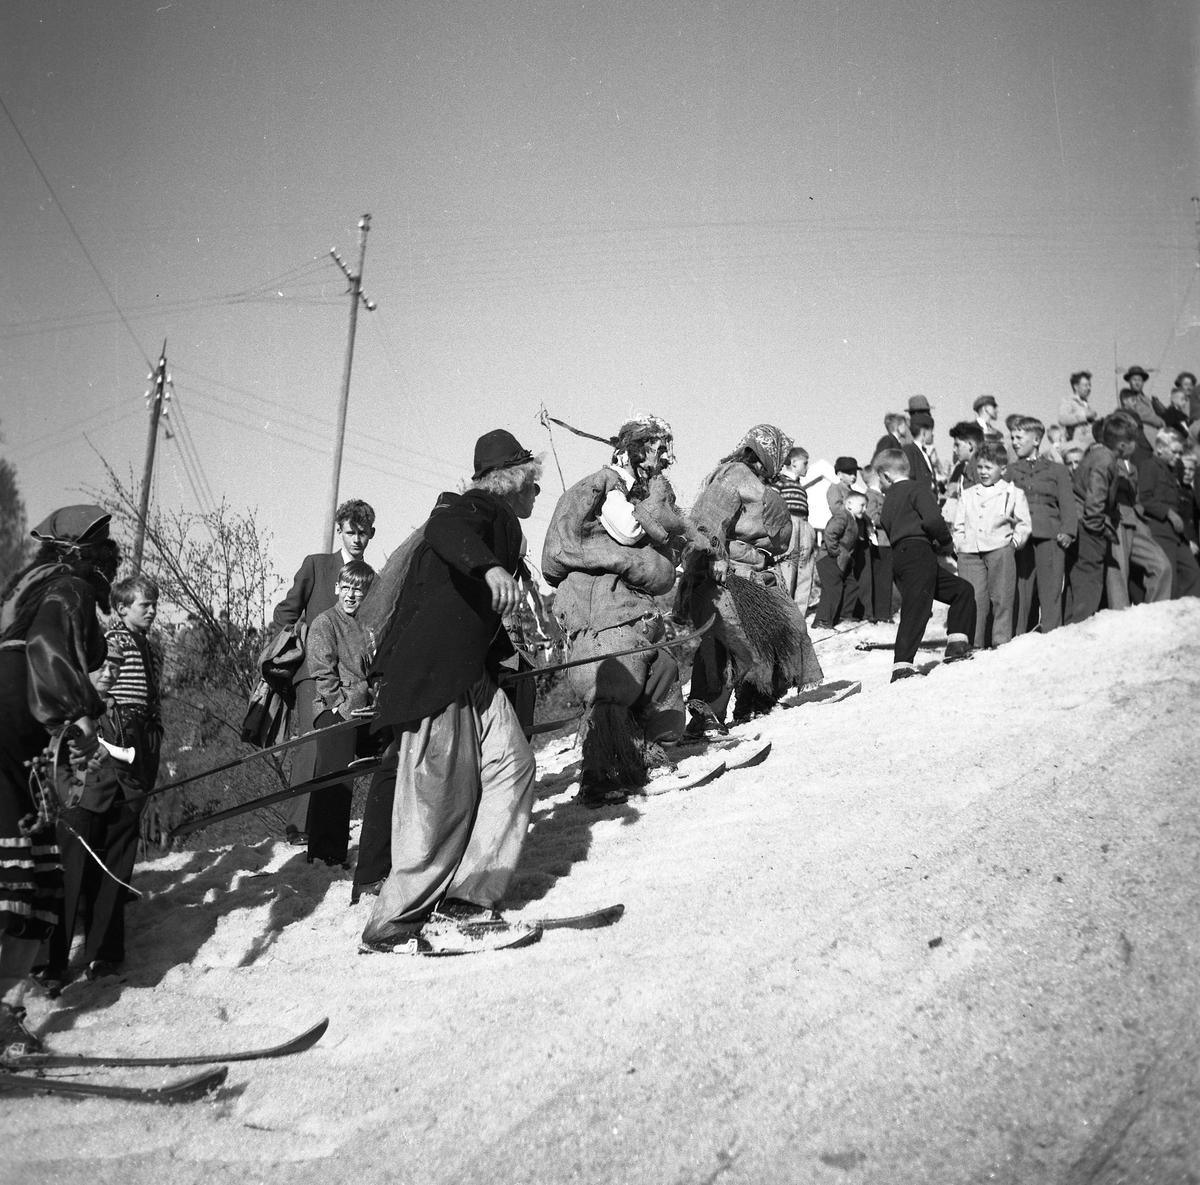 Ski show at Skauløkka, Kongsberg